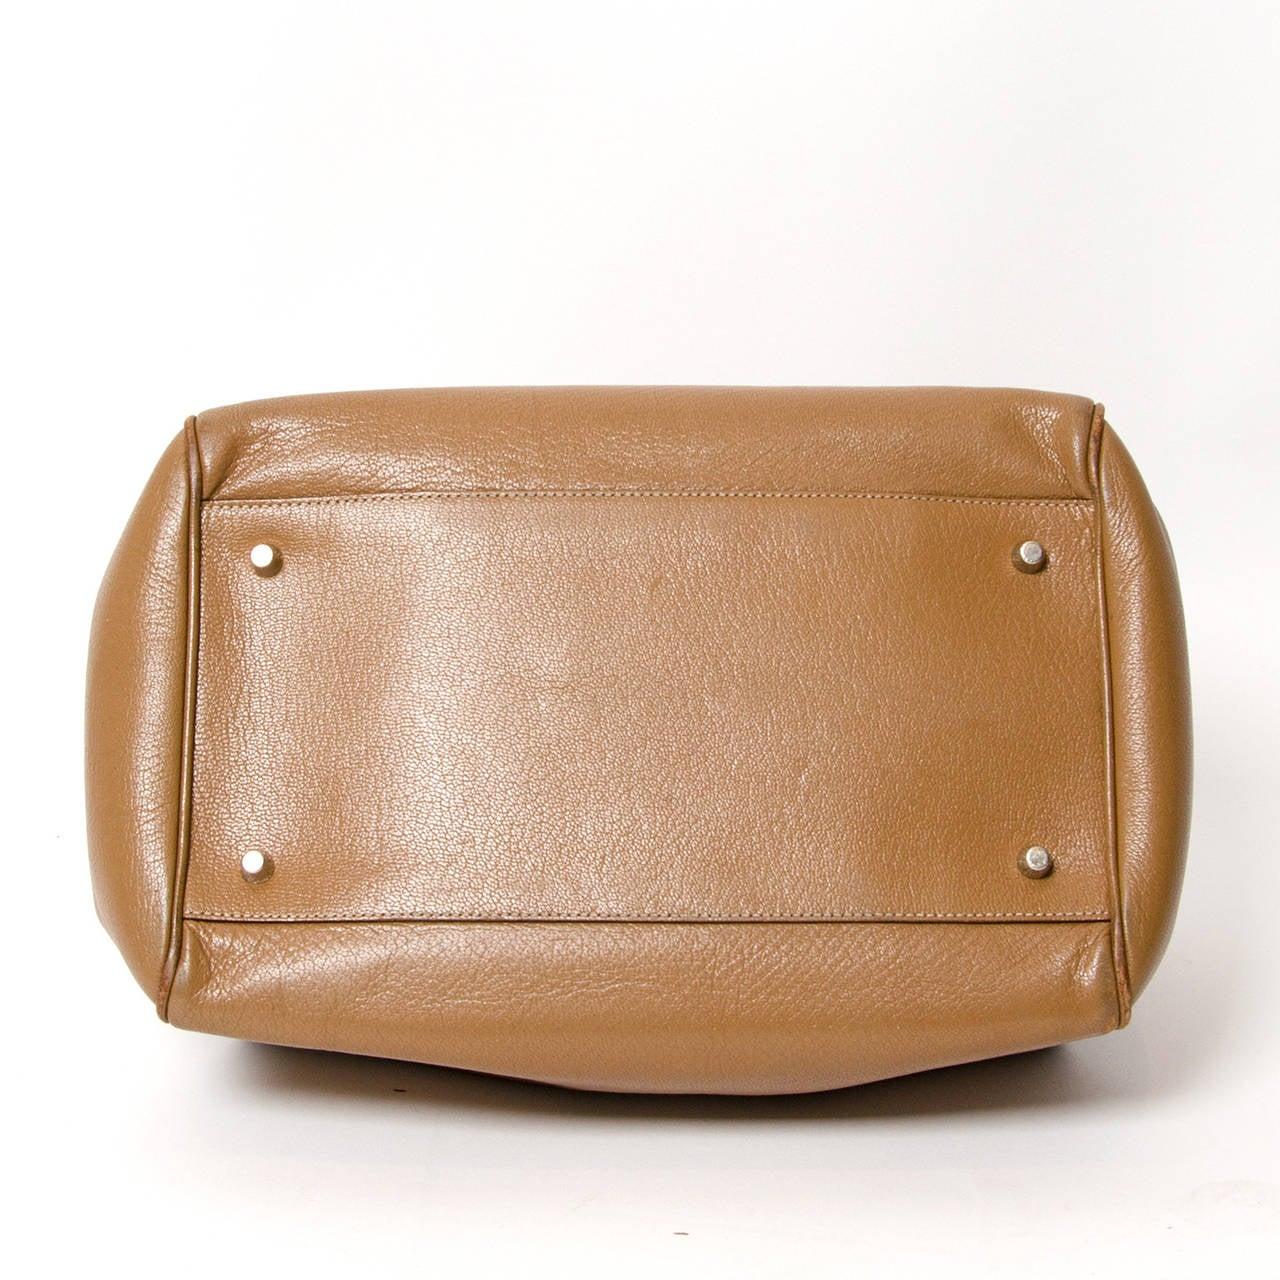 b6fa5f9f388747 Women's Prada Leather Madras Cerniera Doctor Bag For Sale